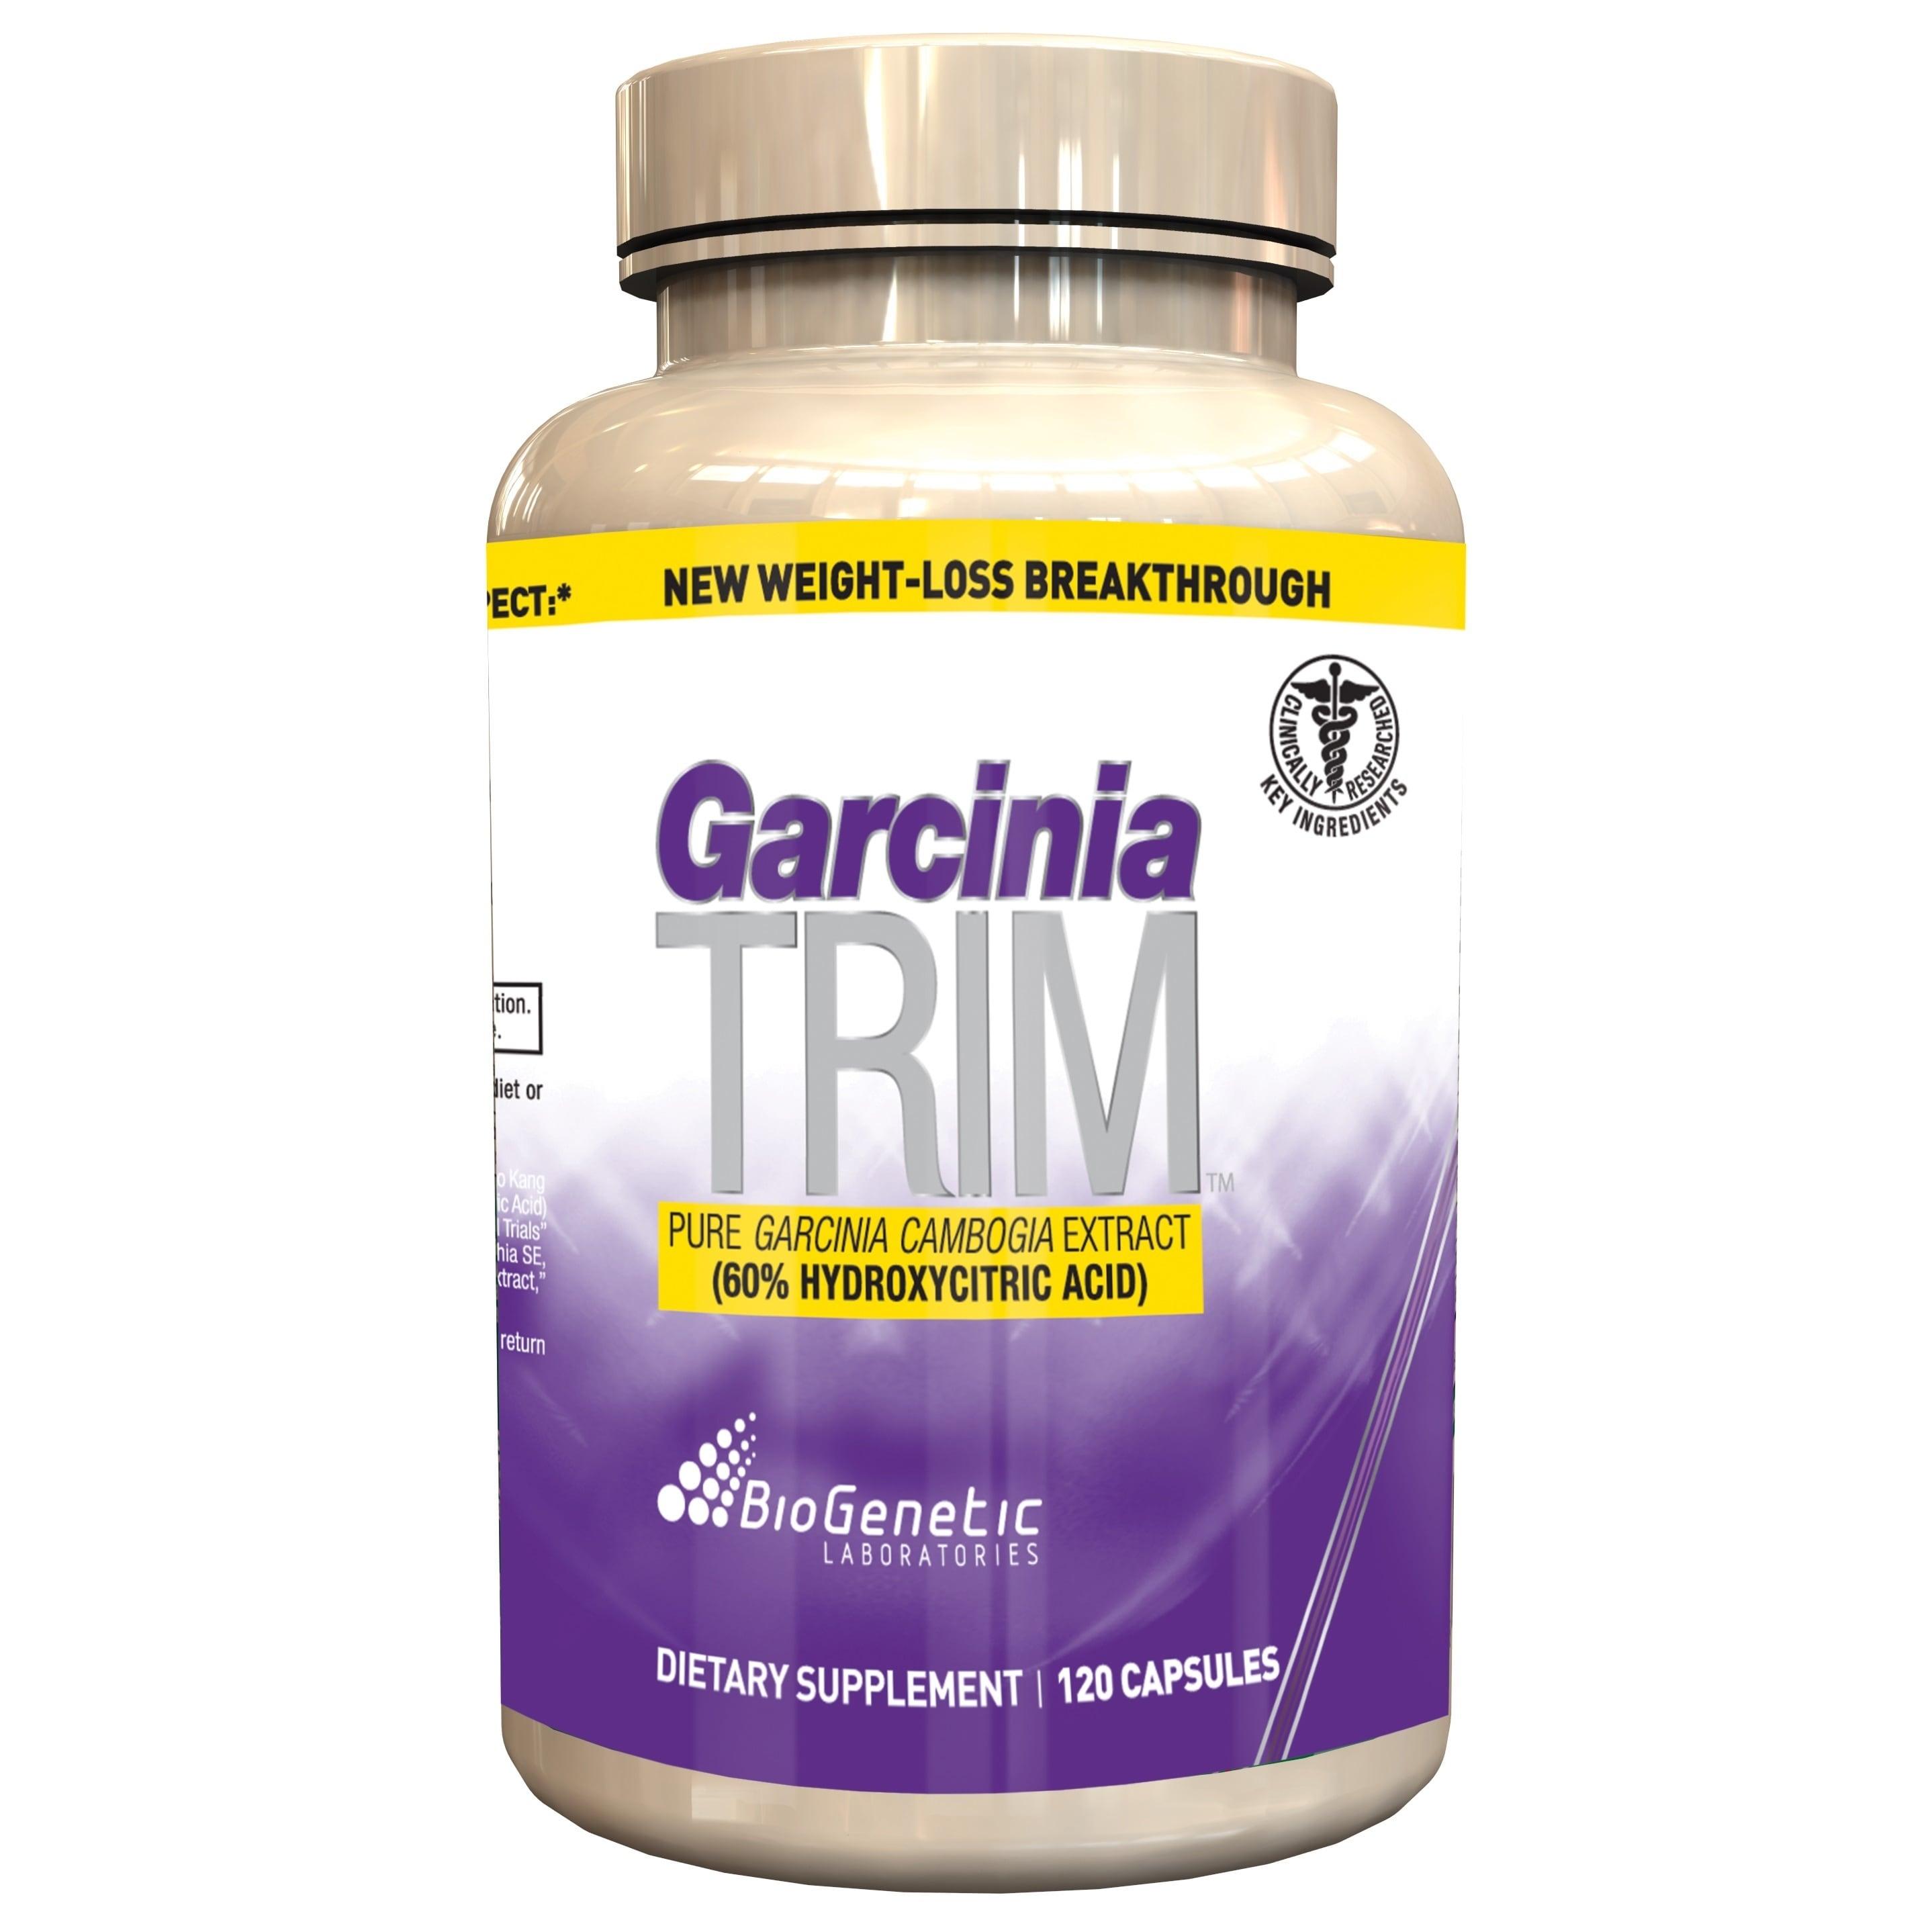 Caralluma fimbriata extract uses